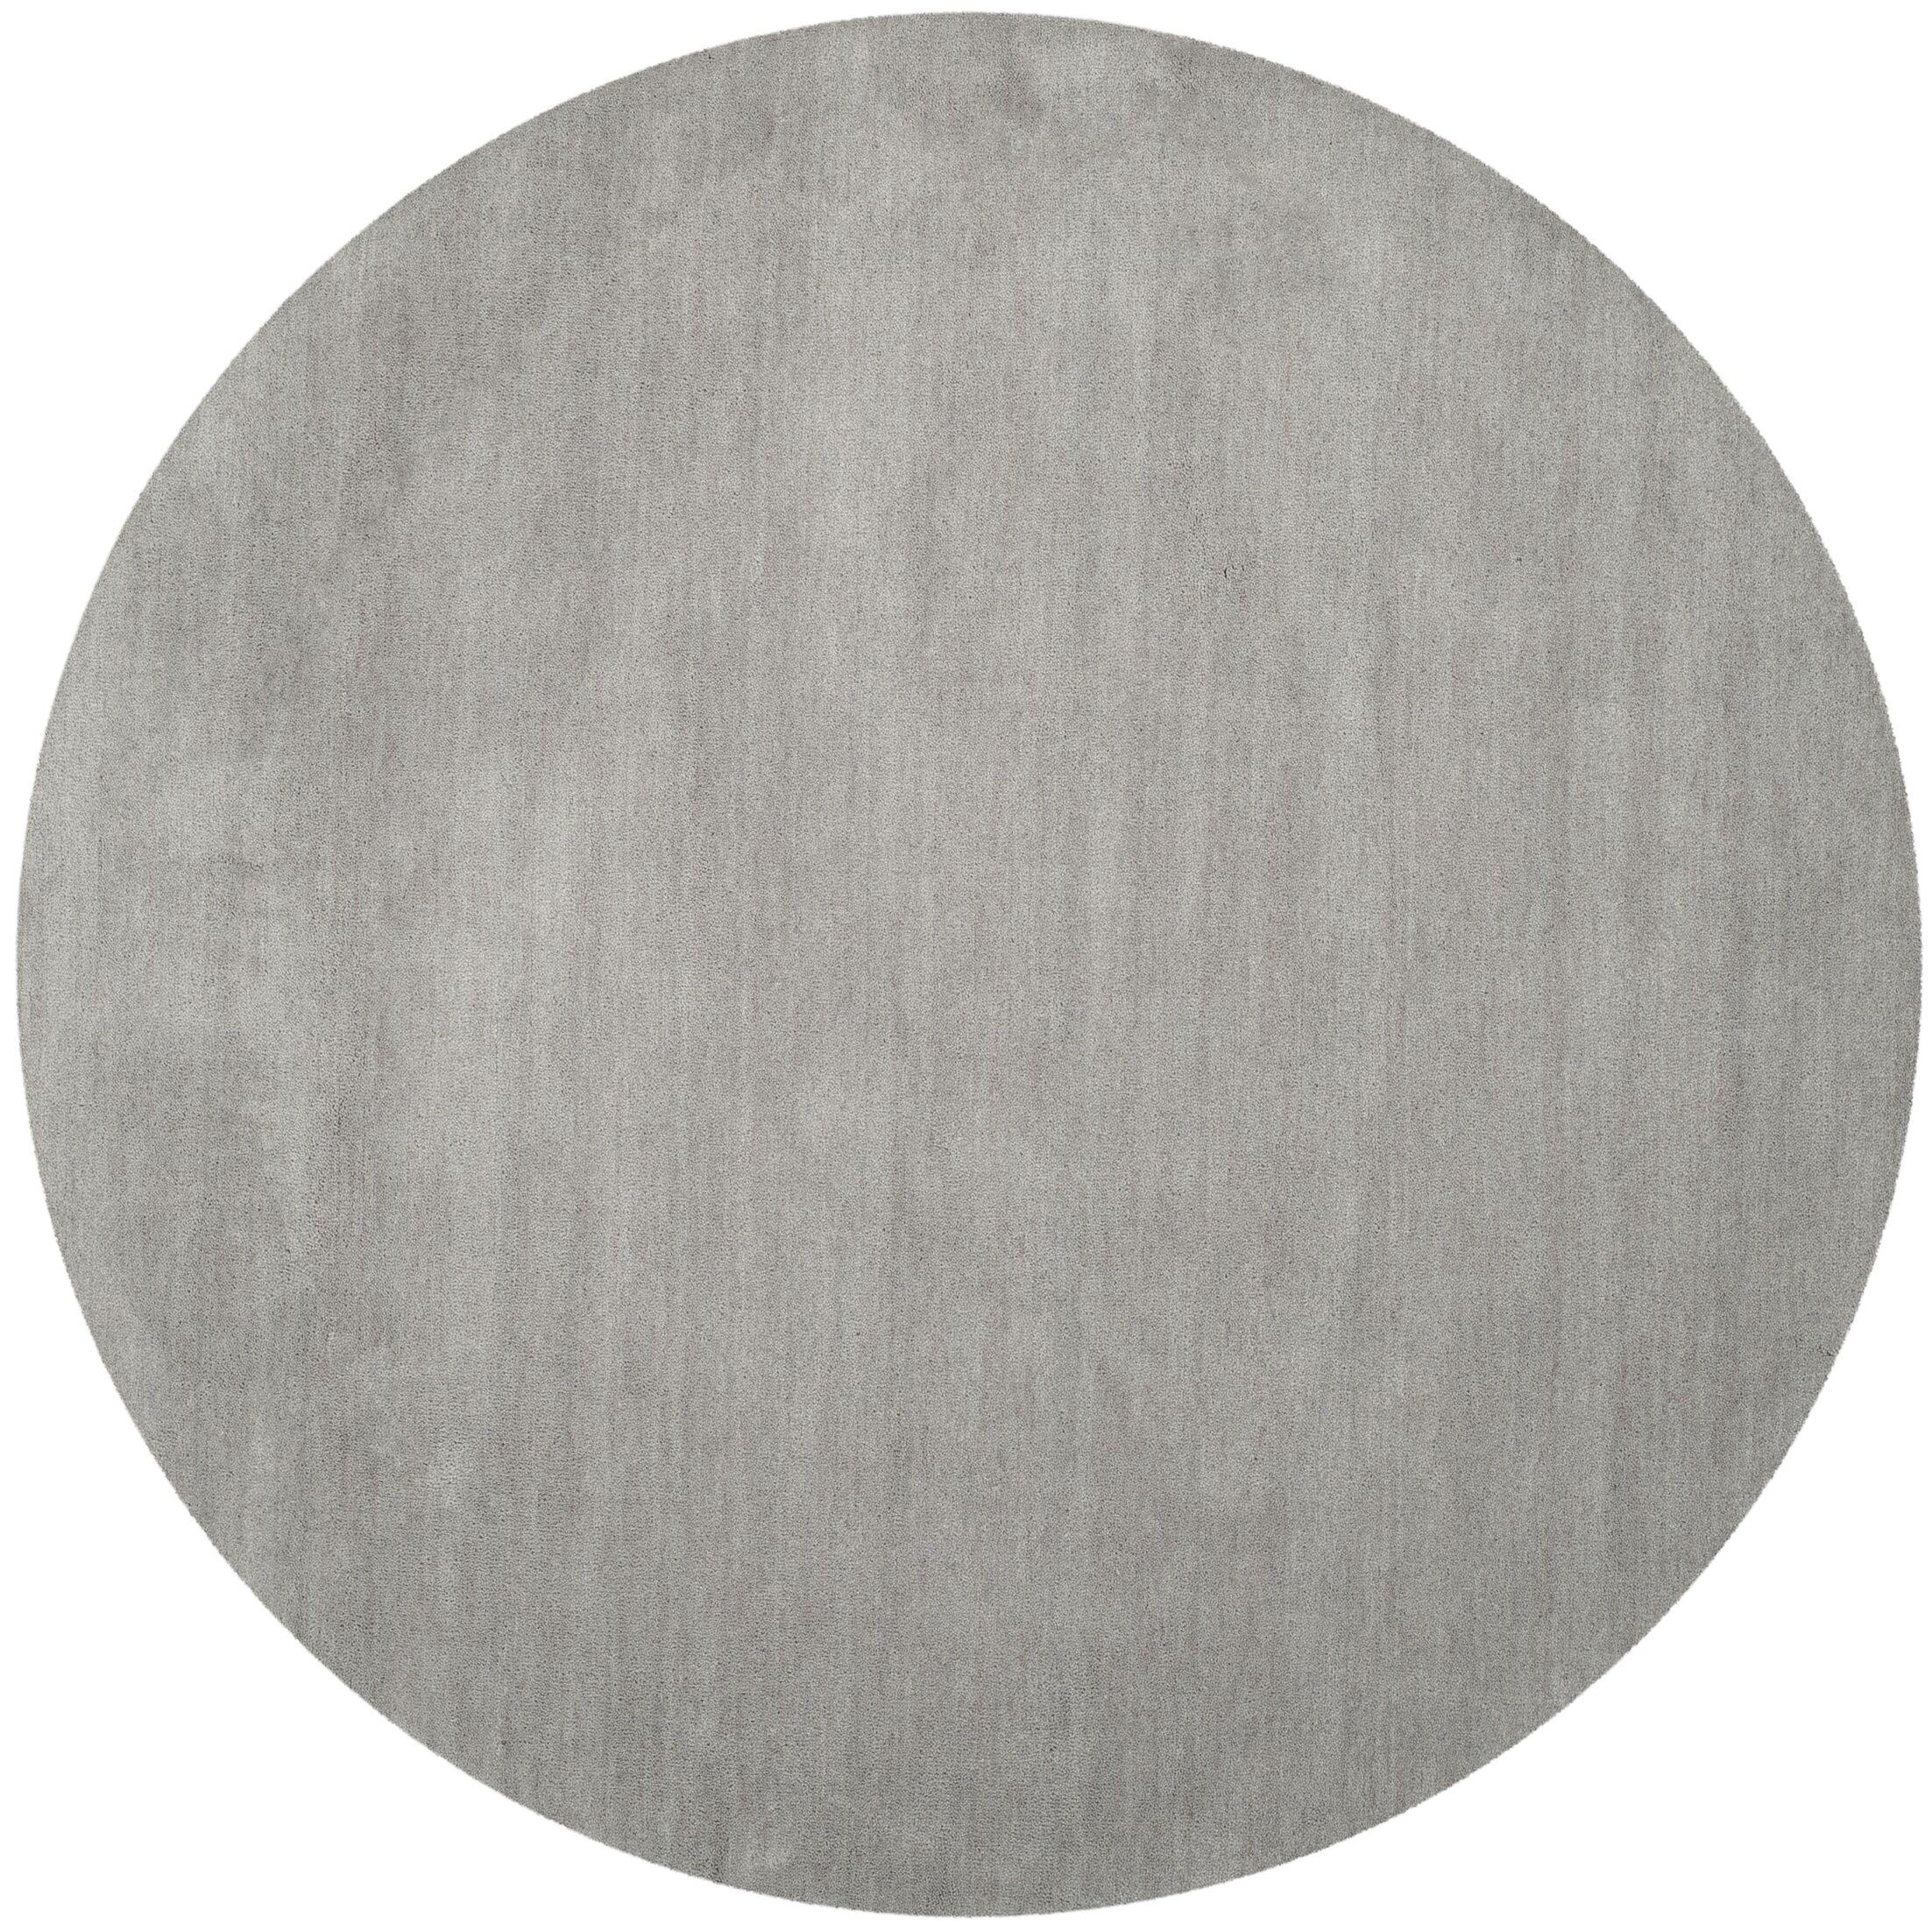 Bargo Hand-Woven Wool Grey Area Rug Rug Size: Round 4'